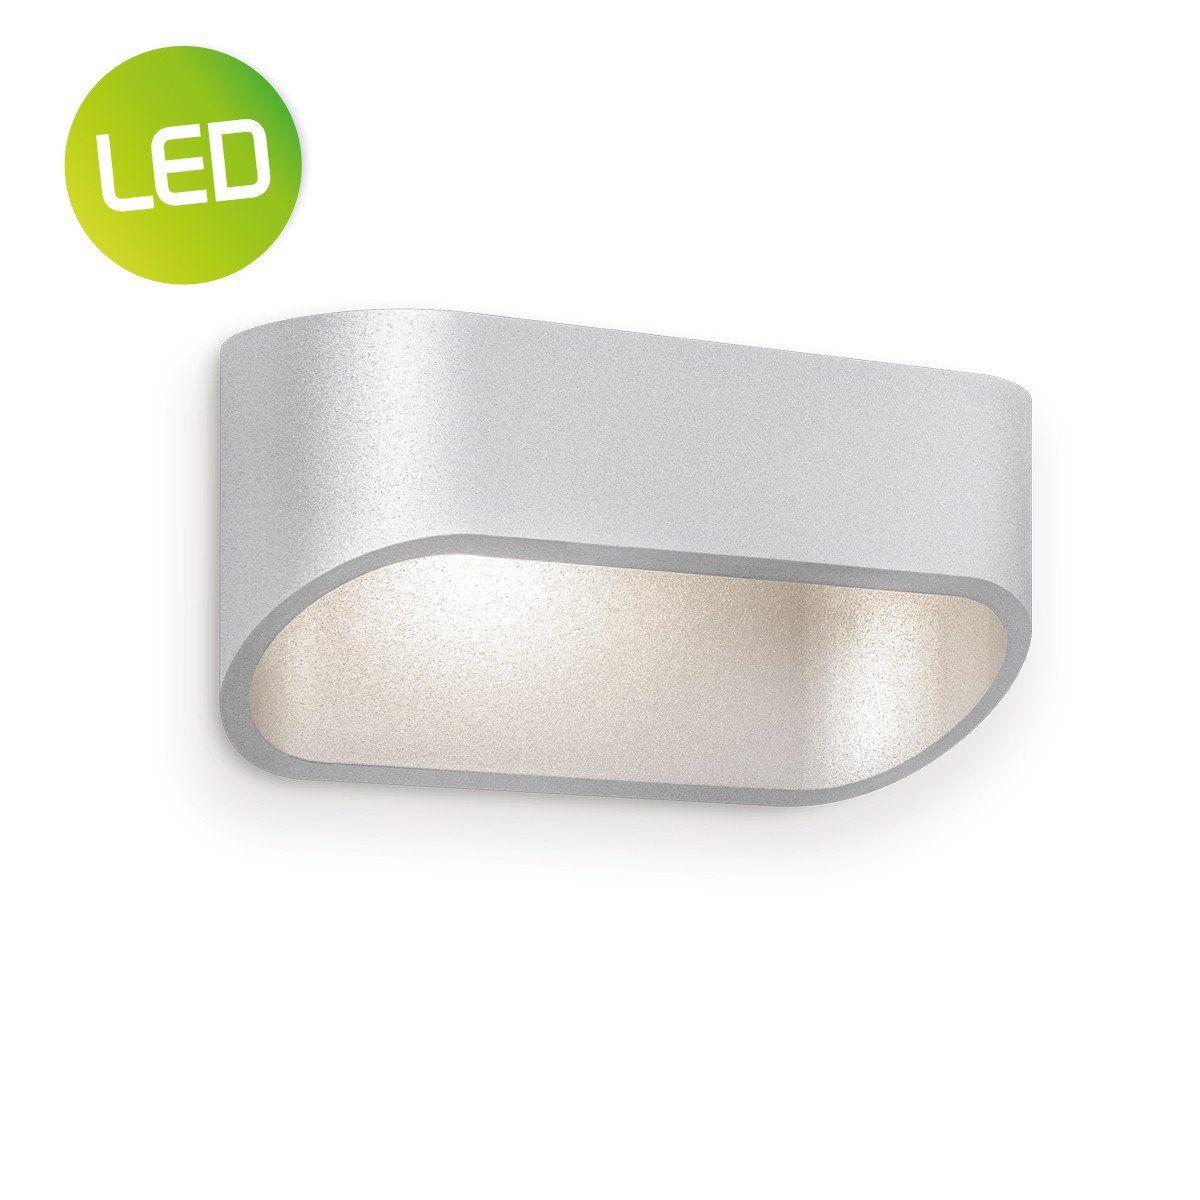 LED wandlamp lizzie ↔ 16,2 cm zilvergrijs | Besselink licht ...